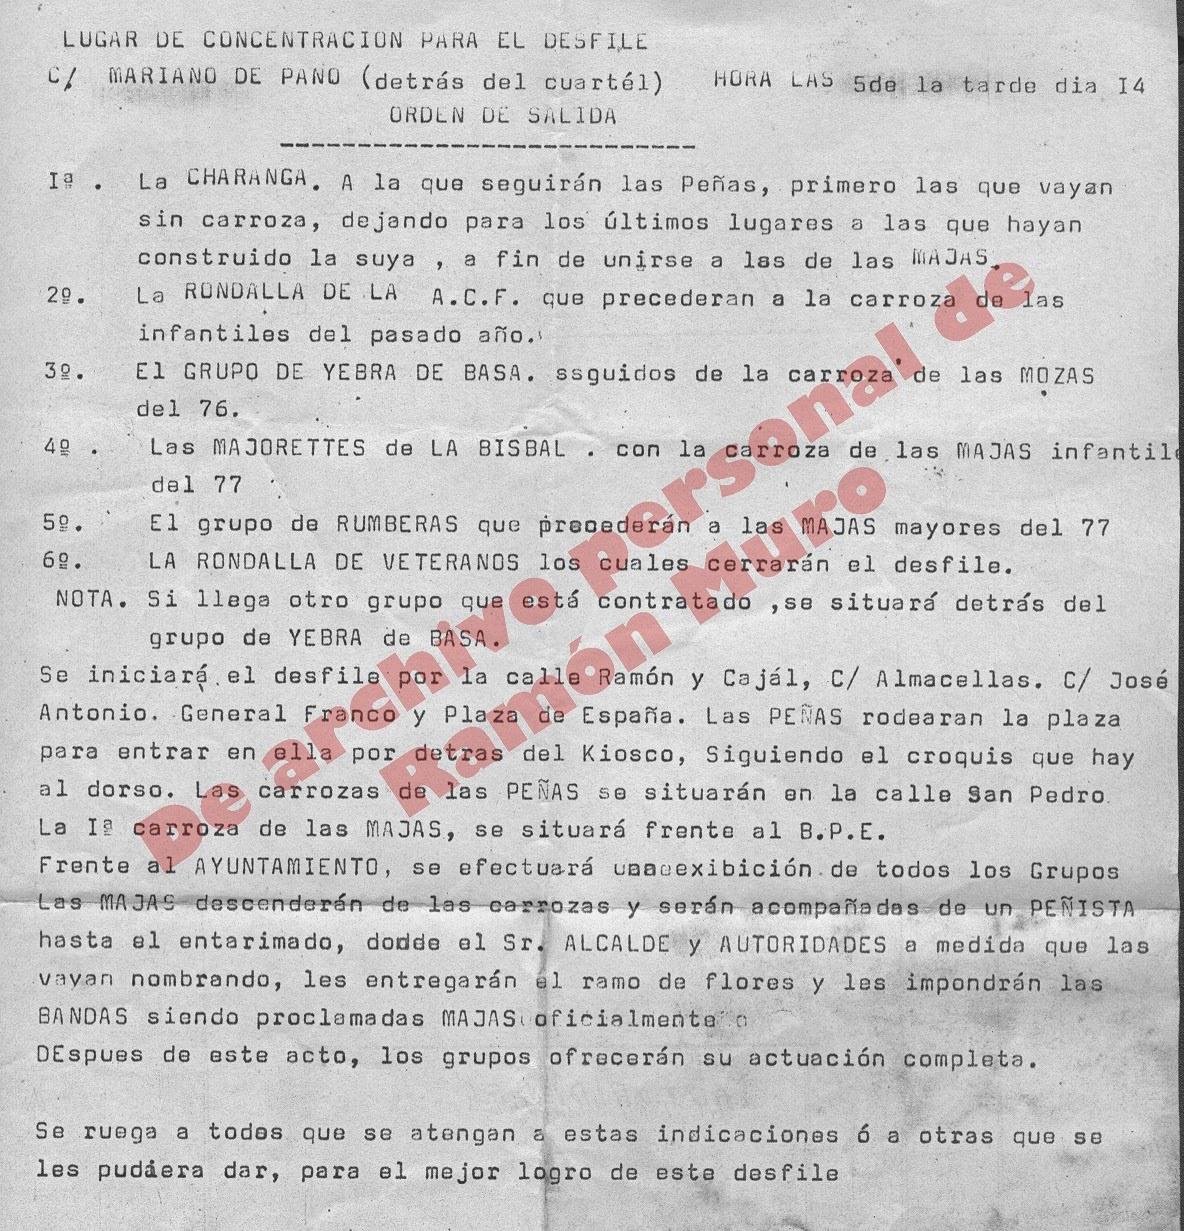 Orden Desfile Fiestas Mayores de Binéfar 1977